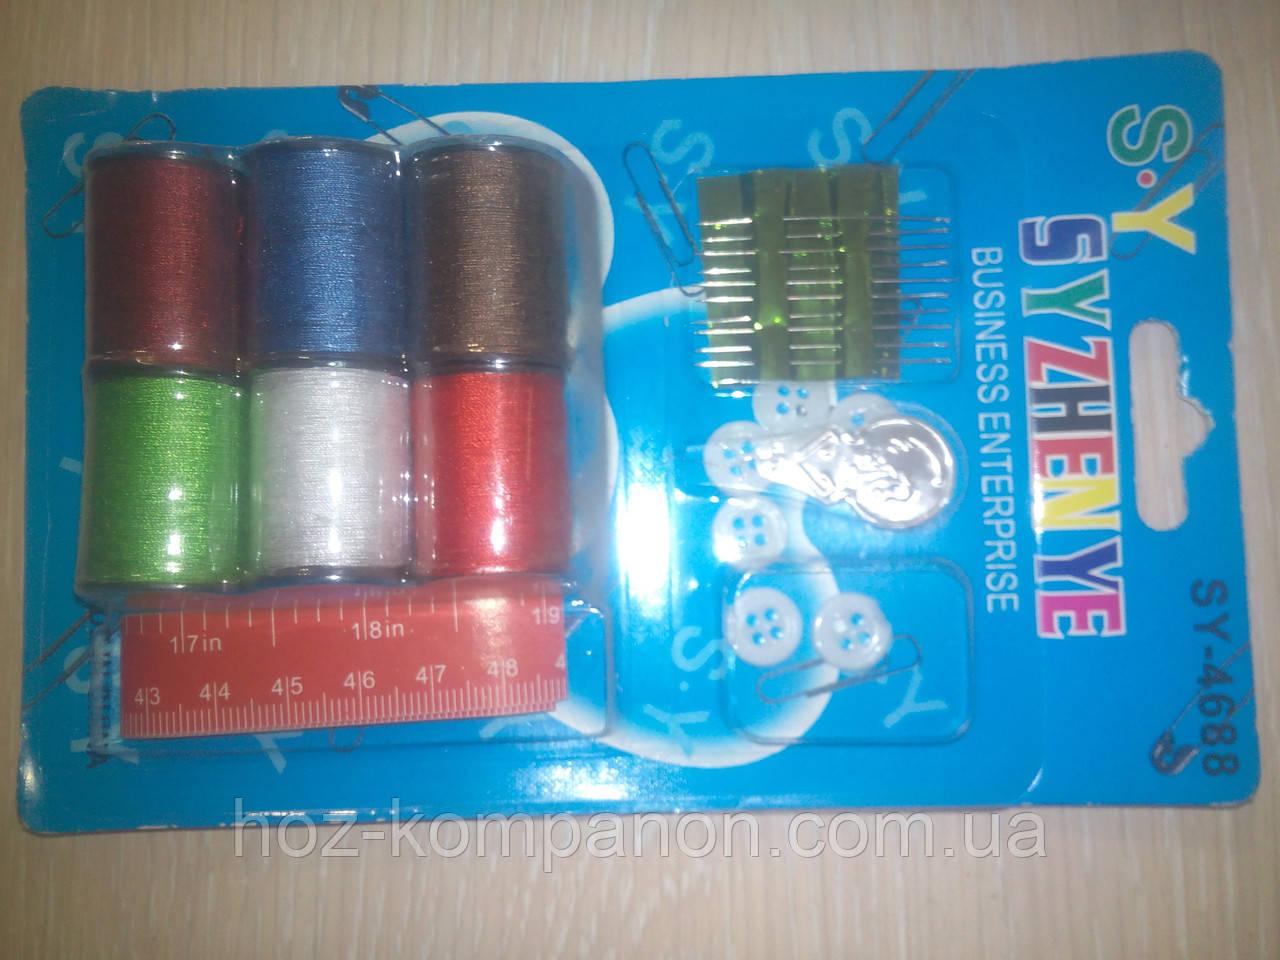 Швейный набор+ сантиметр